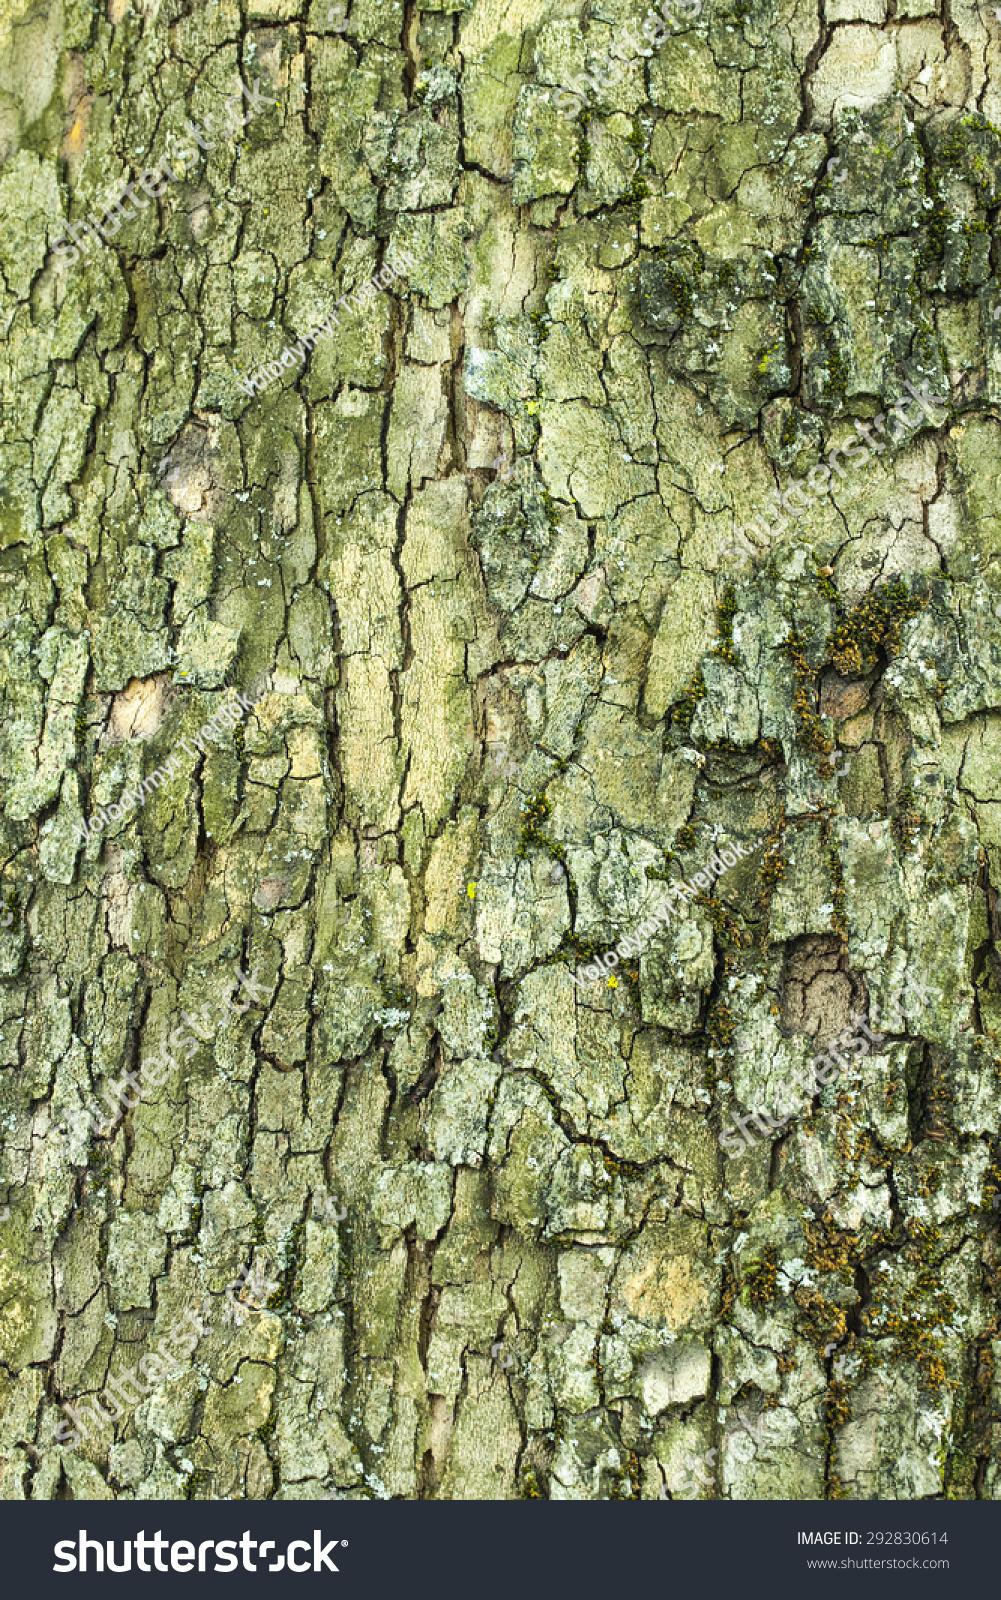 Dry Old Cracked Mossy Tree Bark Stock Photo & Image (Royalty-Free ...